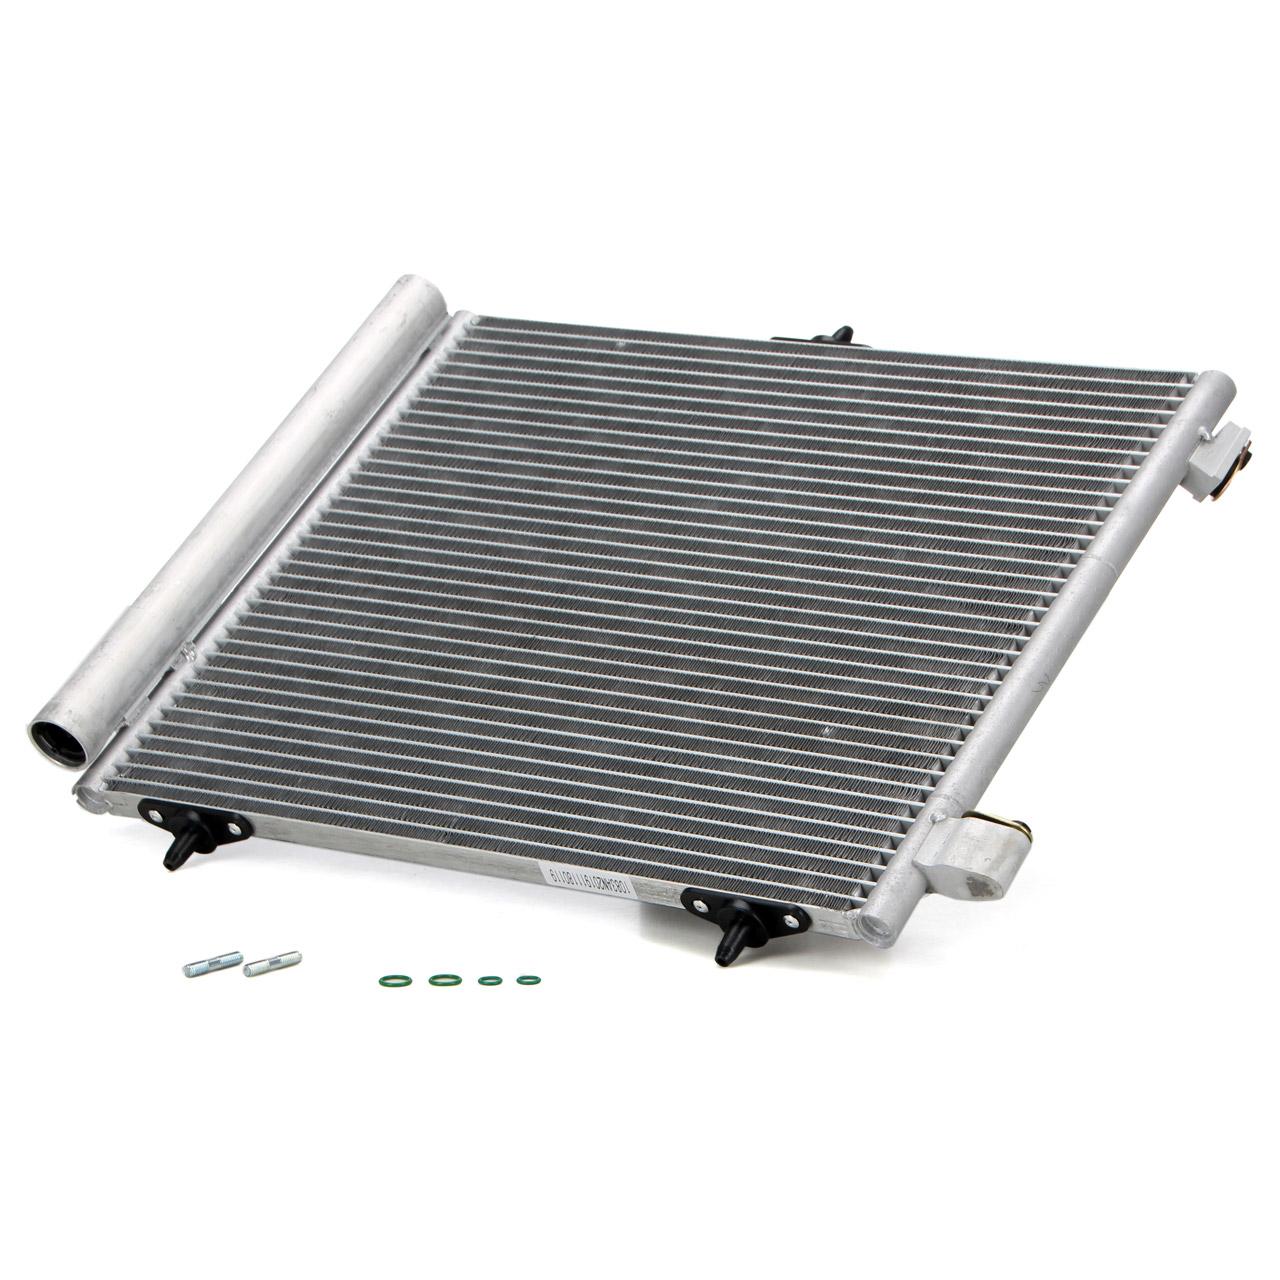 NRF 35405 EASY FIT Kondensator Klima PEUGEOT 207 208 1007 2008 CITROEN C2 C3 1 2 3 C4 DS3